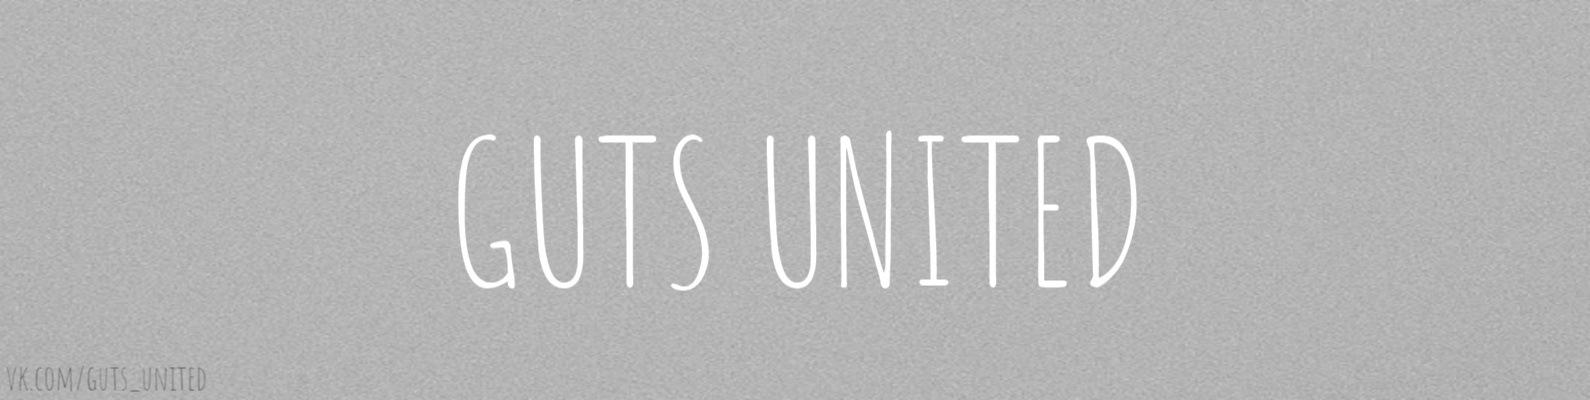 Guts United: I Am Innocent | Sentence | ВКонтакте